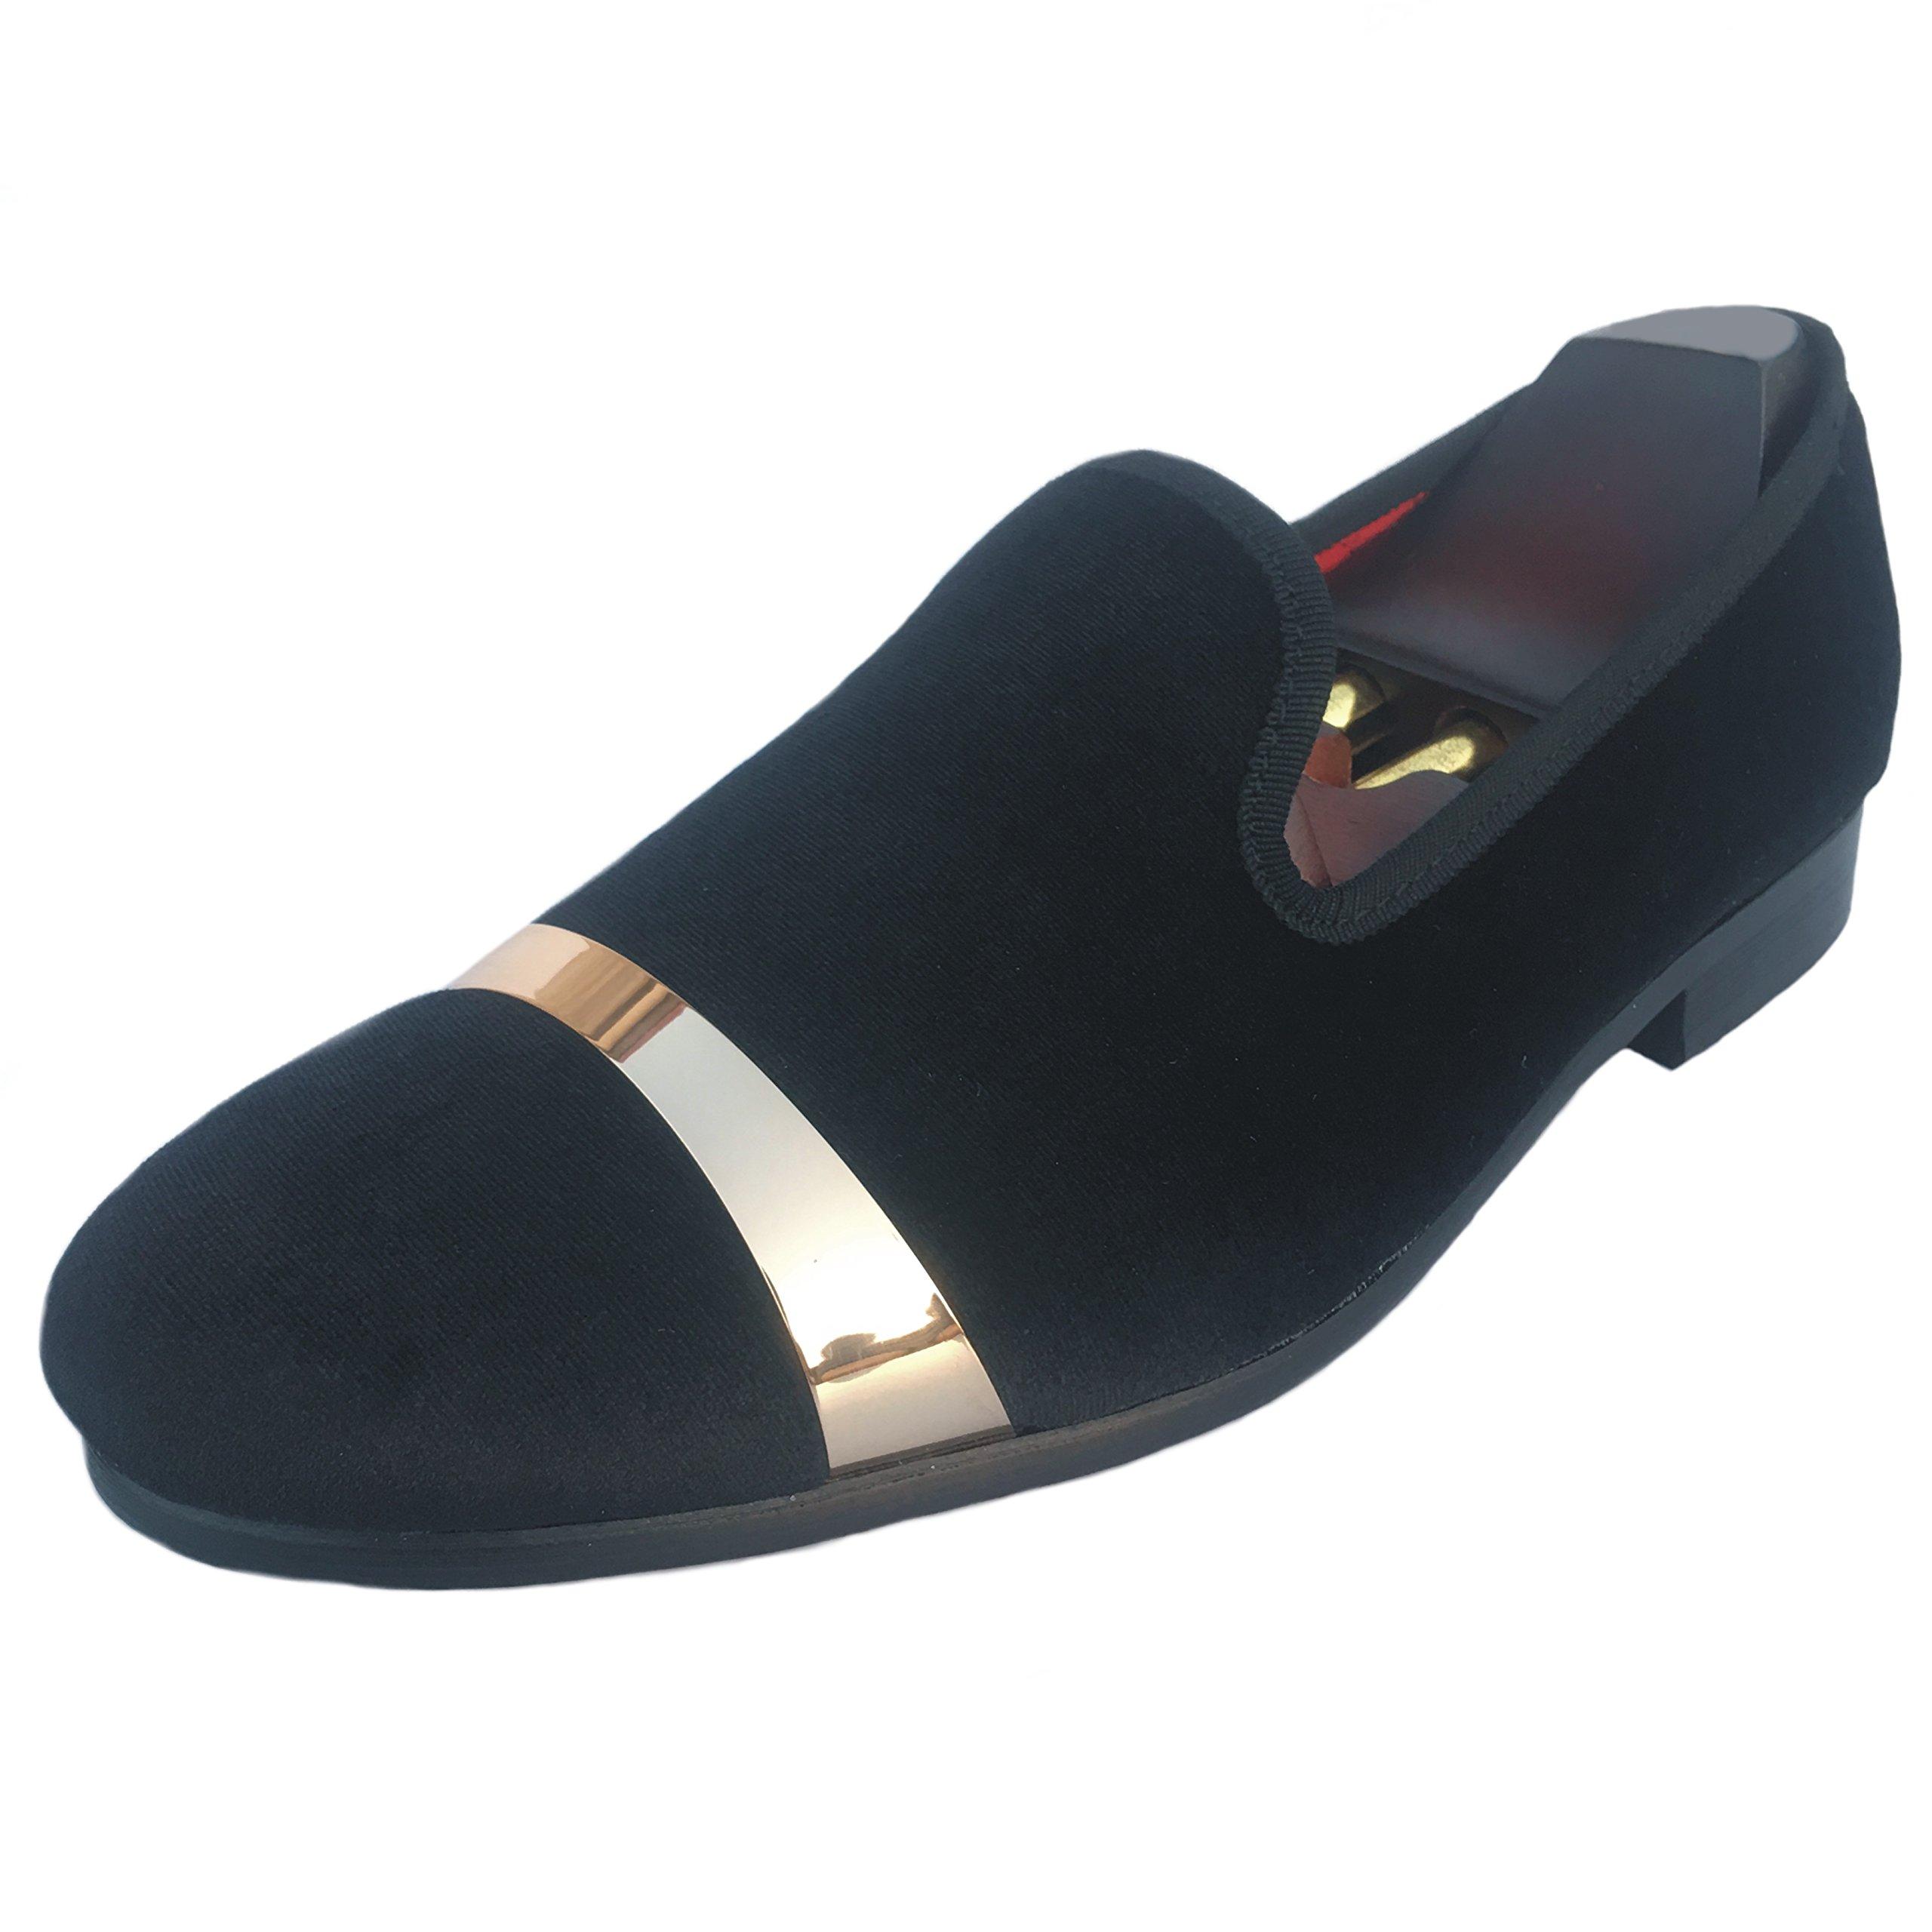 Justar Men's Velvet Loafers Dress Shoes Slip-on Wedding Slippers Flats Gold Buckle (7 D(M) US, Black) by Justar